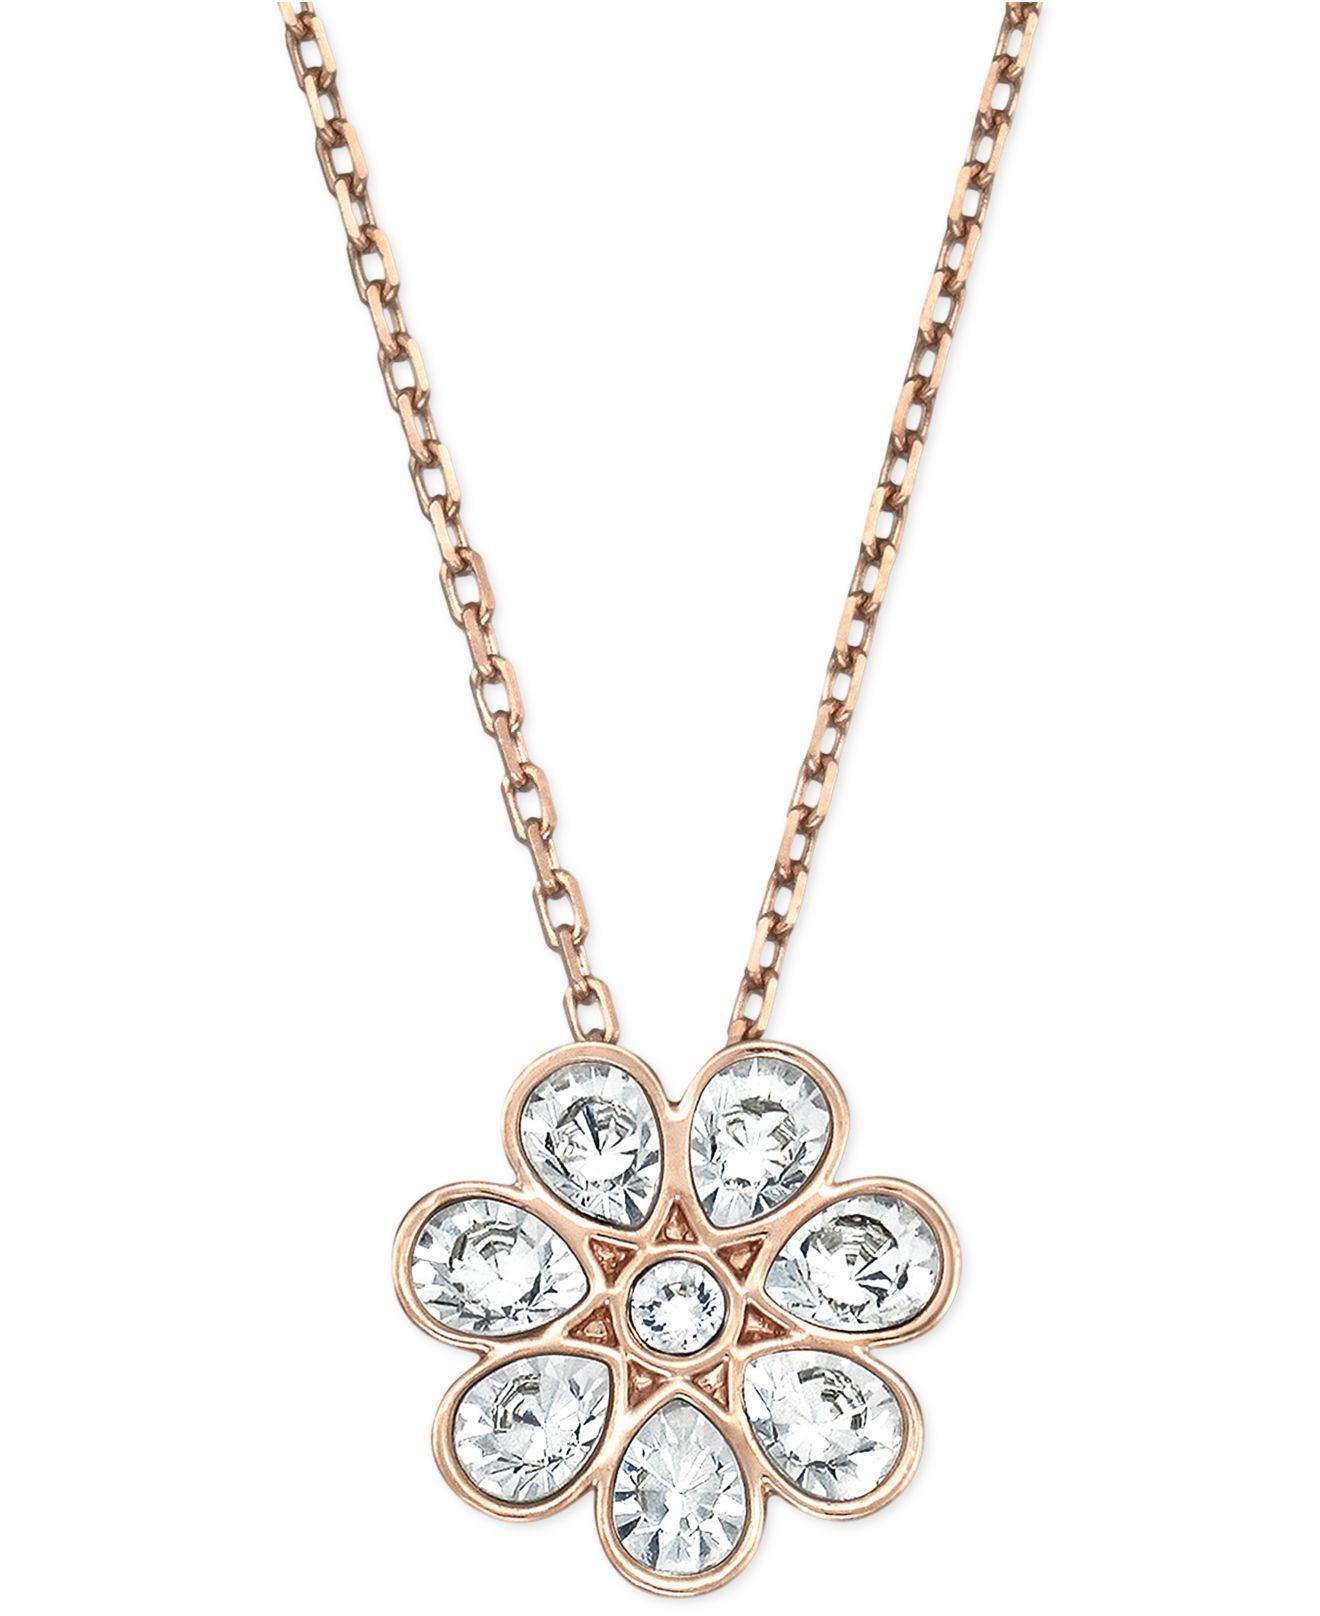 Swarovski Rose Gold Tone Crystal Flower Pendant Necklace